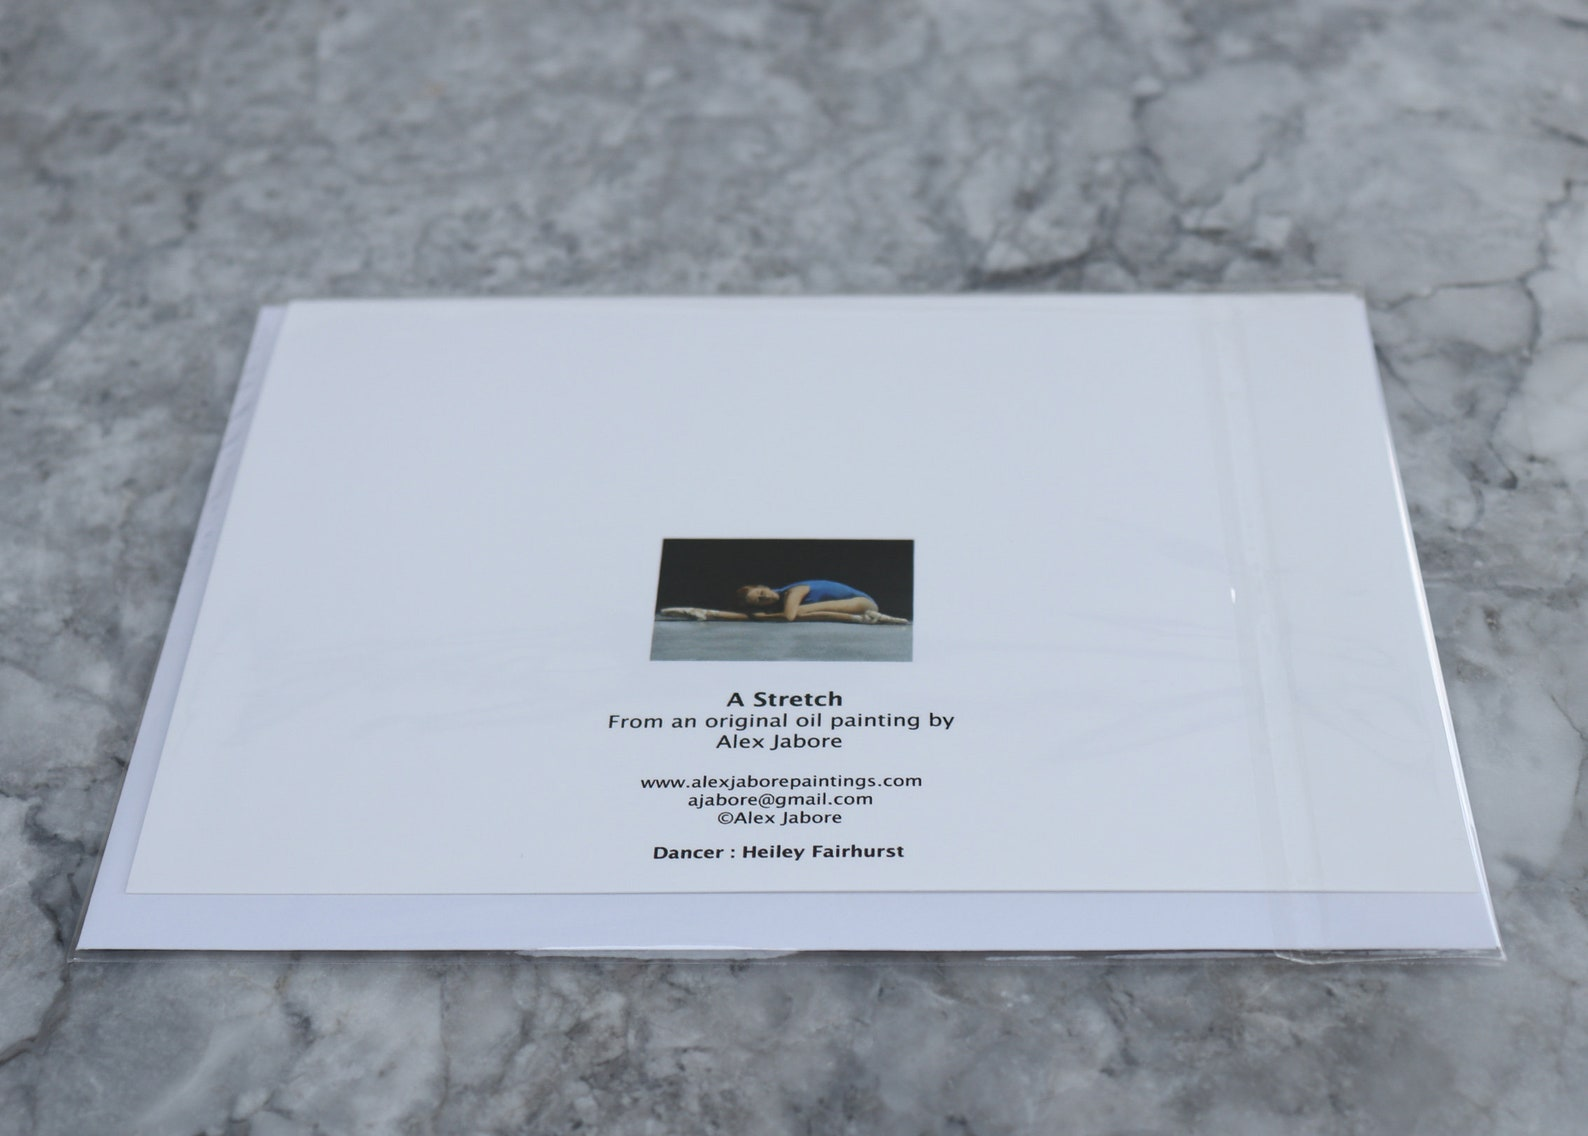 the stretch, ballet dancer, artwork print / birthday cards, christmas art prints based on original artwork uk artist alex jabore